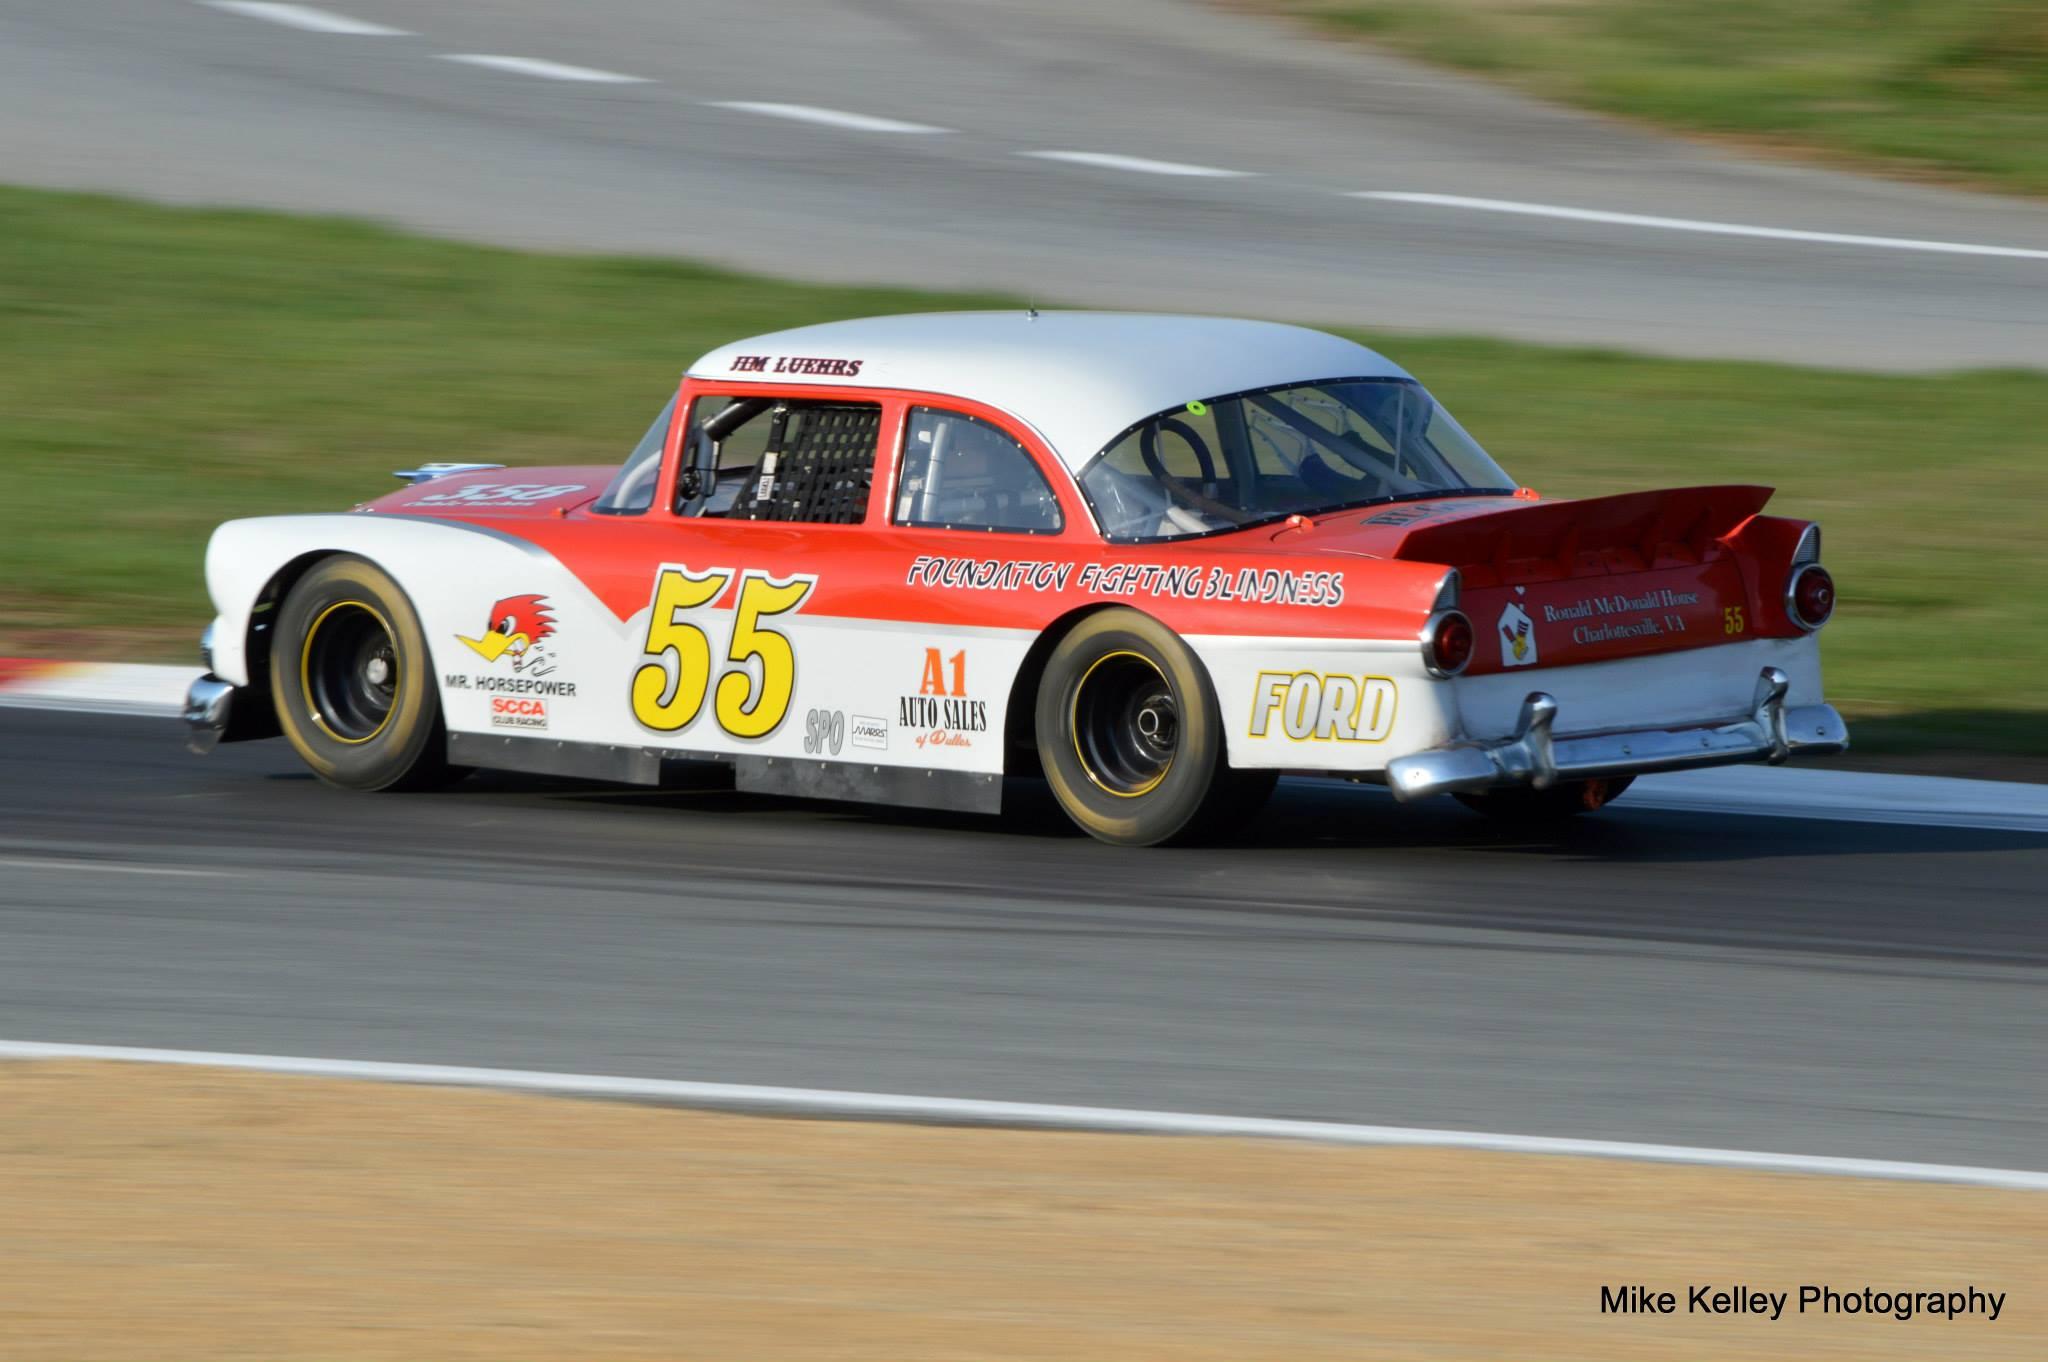 Road Racing Optional Classes Wdcr Scca